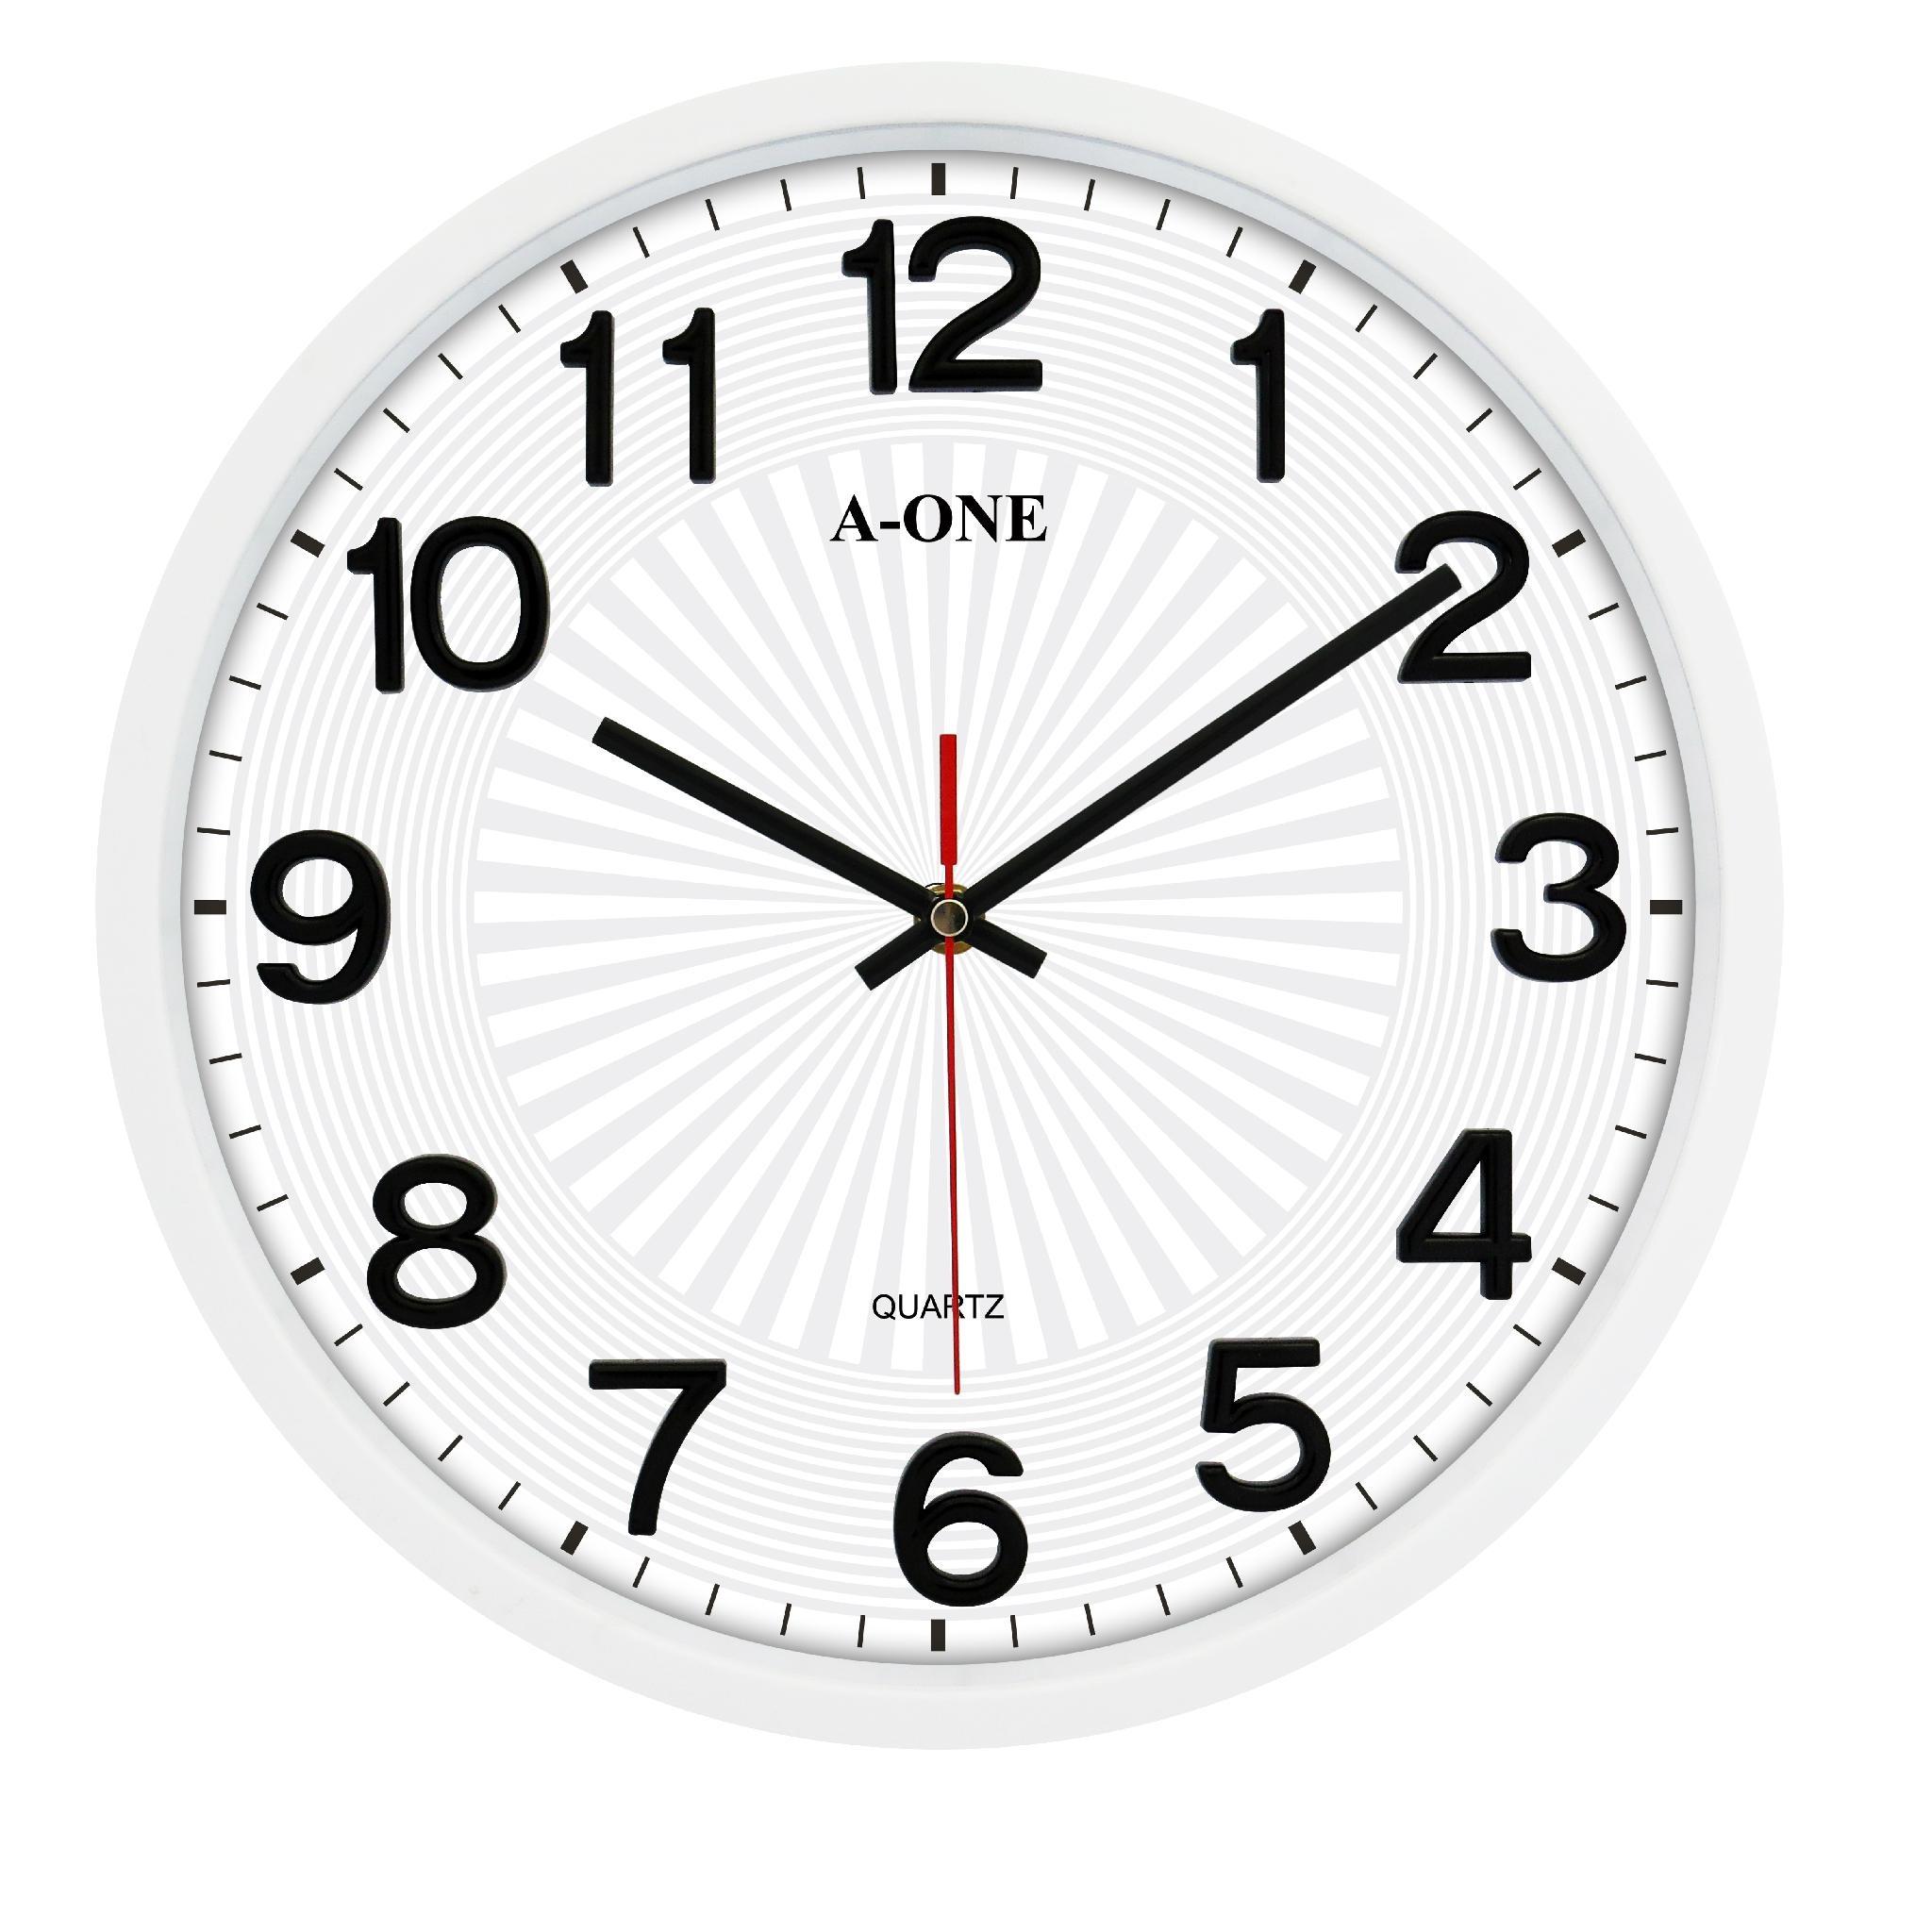 TG-0260 超靜音立體貼字造型掛鐘(黑) 1